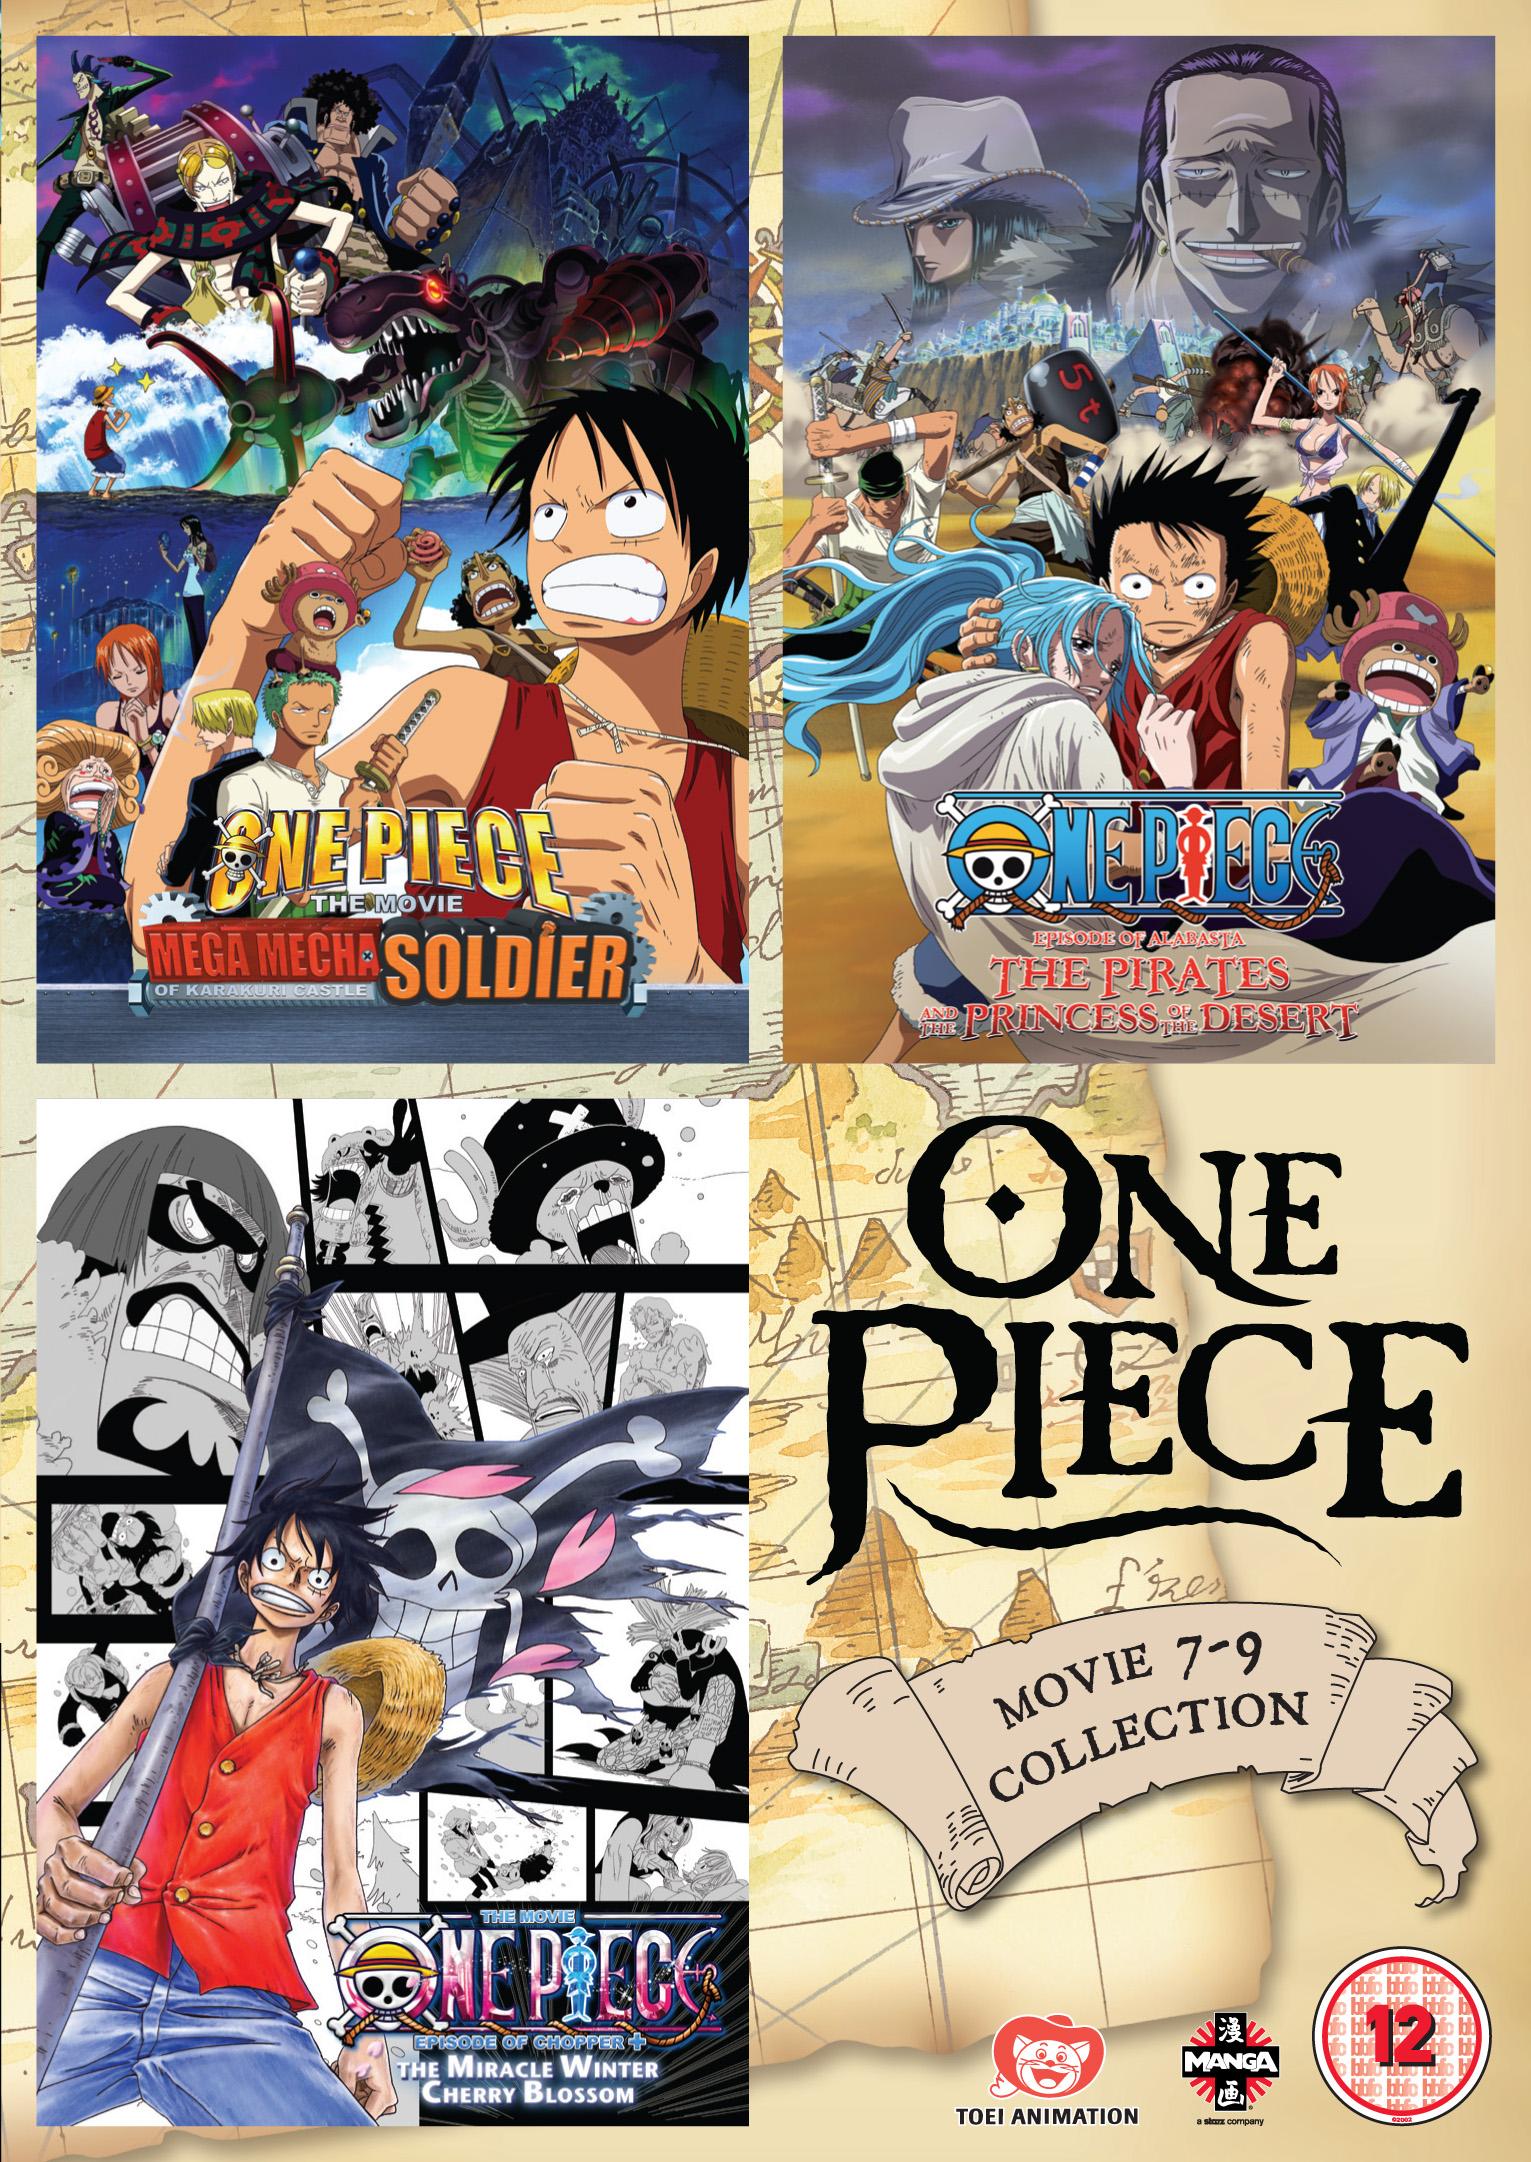 One Piece Movie Collection 3 (Films 5-8) - Fetch Publicity